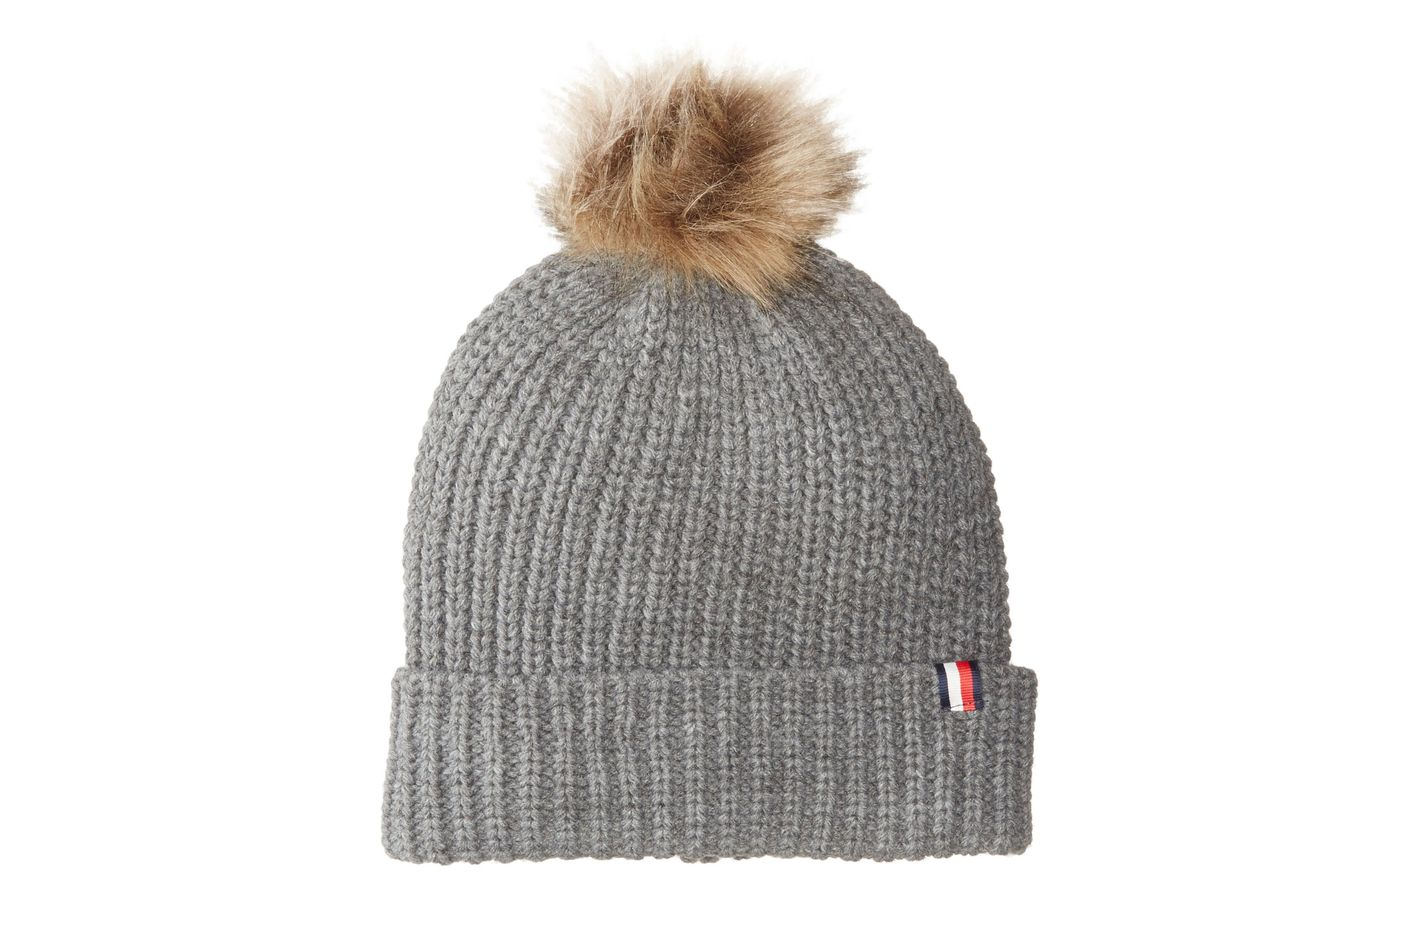 Tommy Hilfiger Women's Rib Cuff Hat With Faux Fur Pom